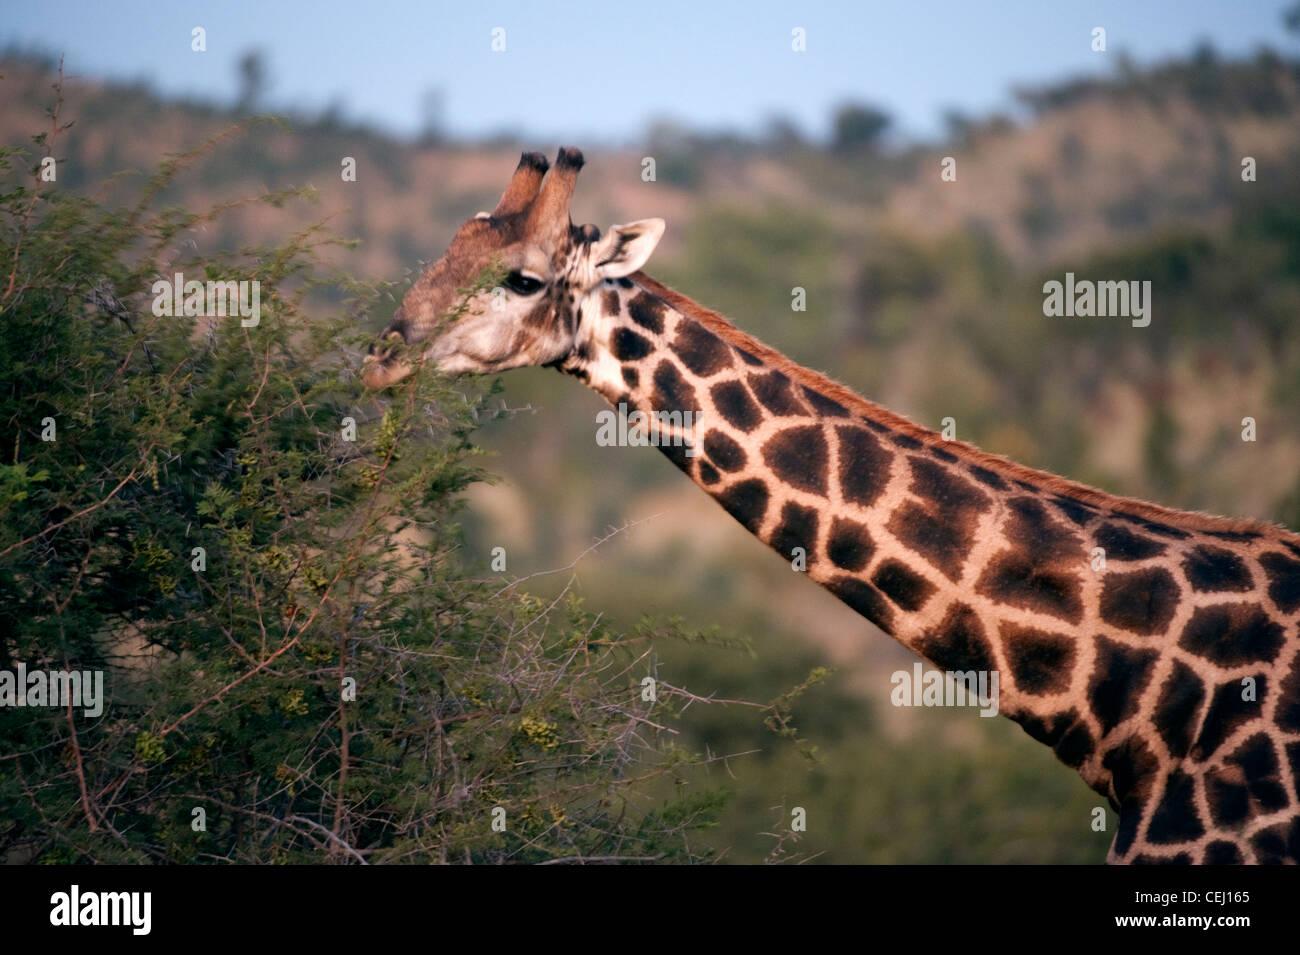 Giraffe,Bakubang Safari Lodge,Pilanesberg Game Reserve,North West Province - Stock Image